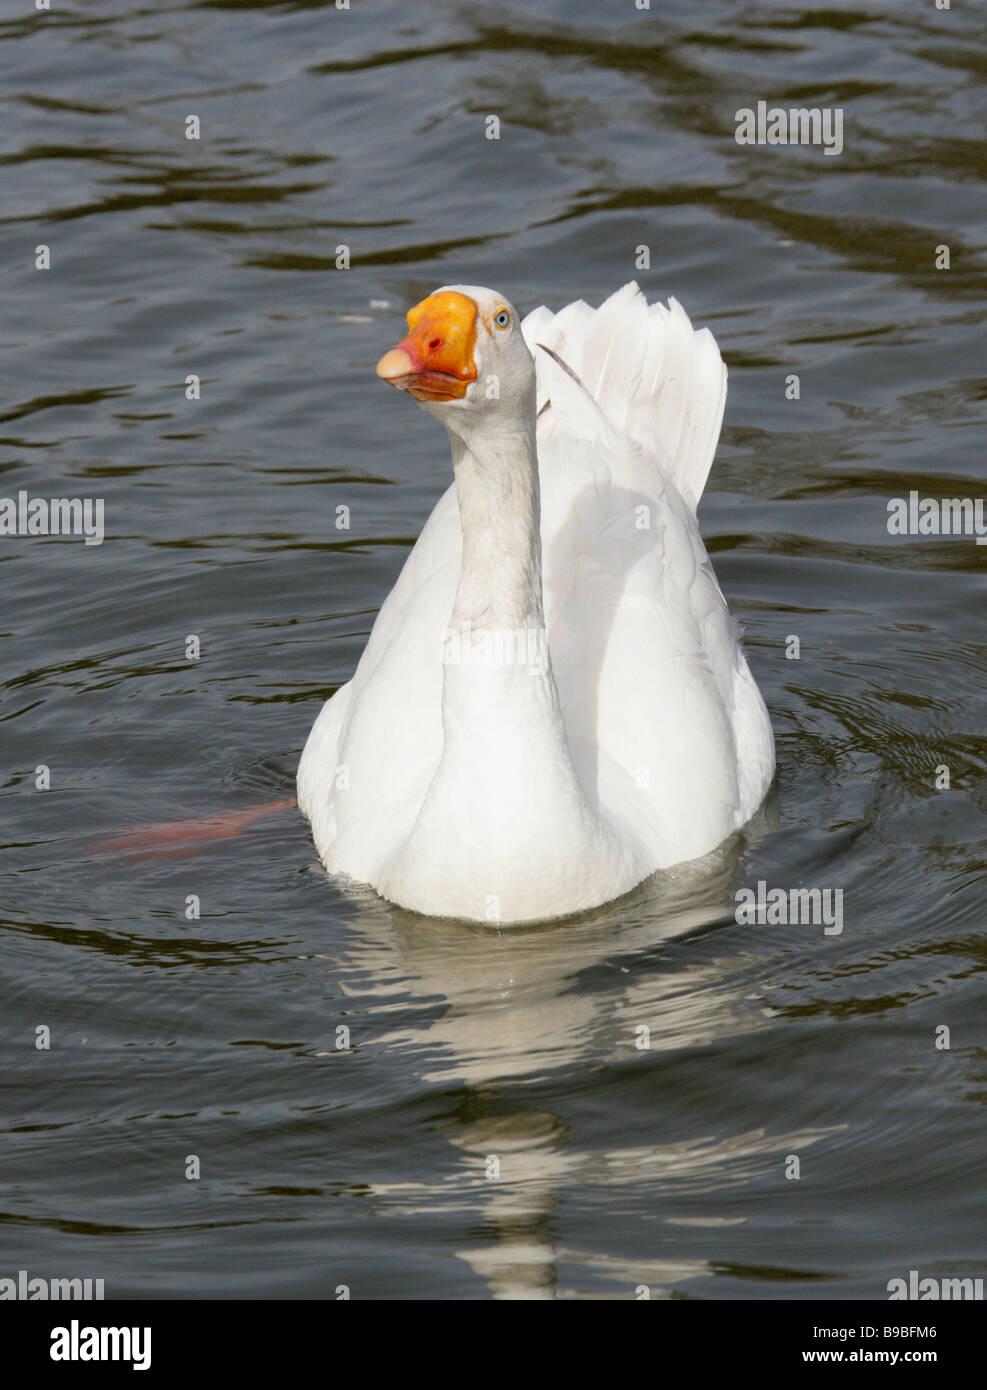 Domestic White Goose, Anatidae - Stock Image